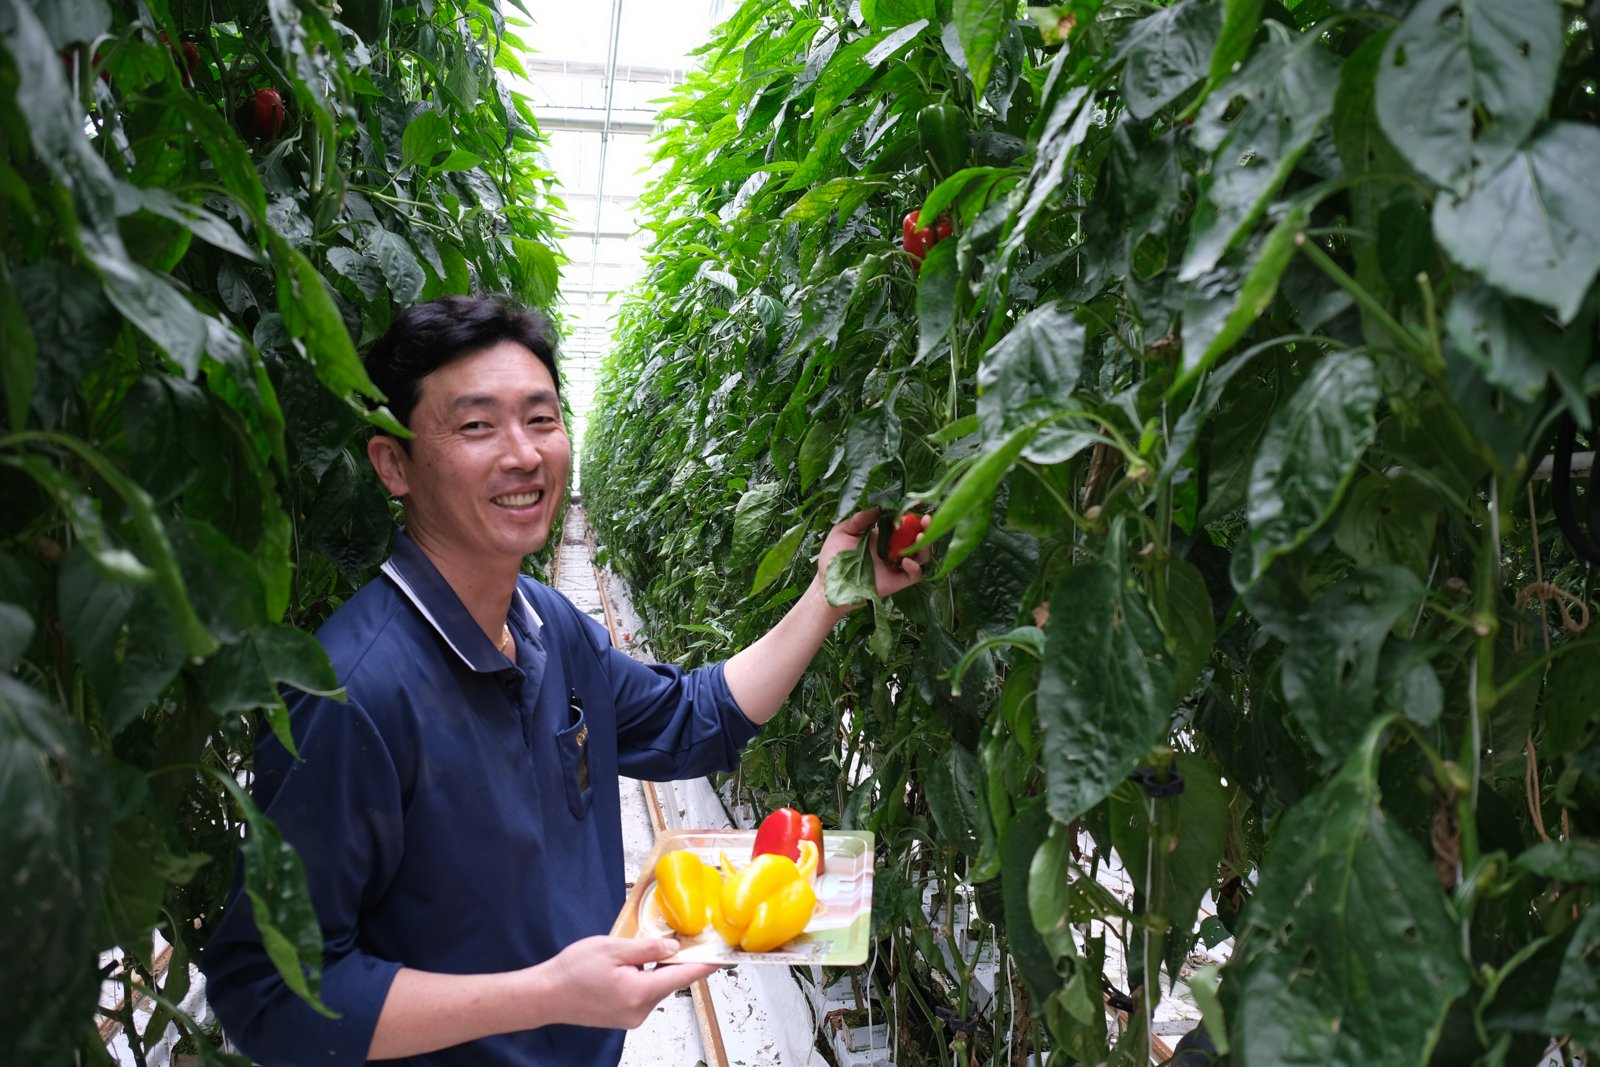 Hyunho Kim, bell pepper farmer, tends to his crop at Korean Air's Jedong Ranch.